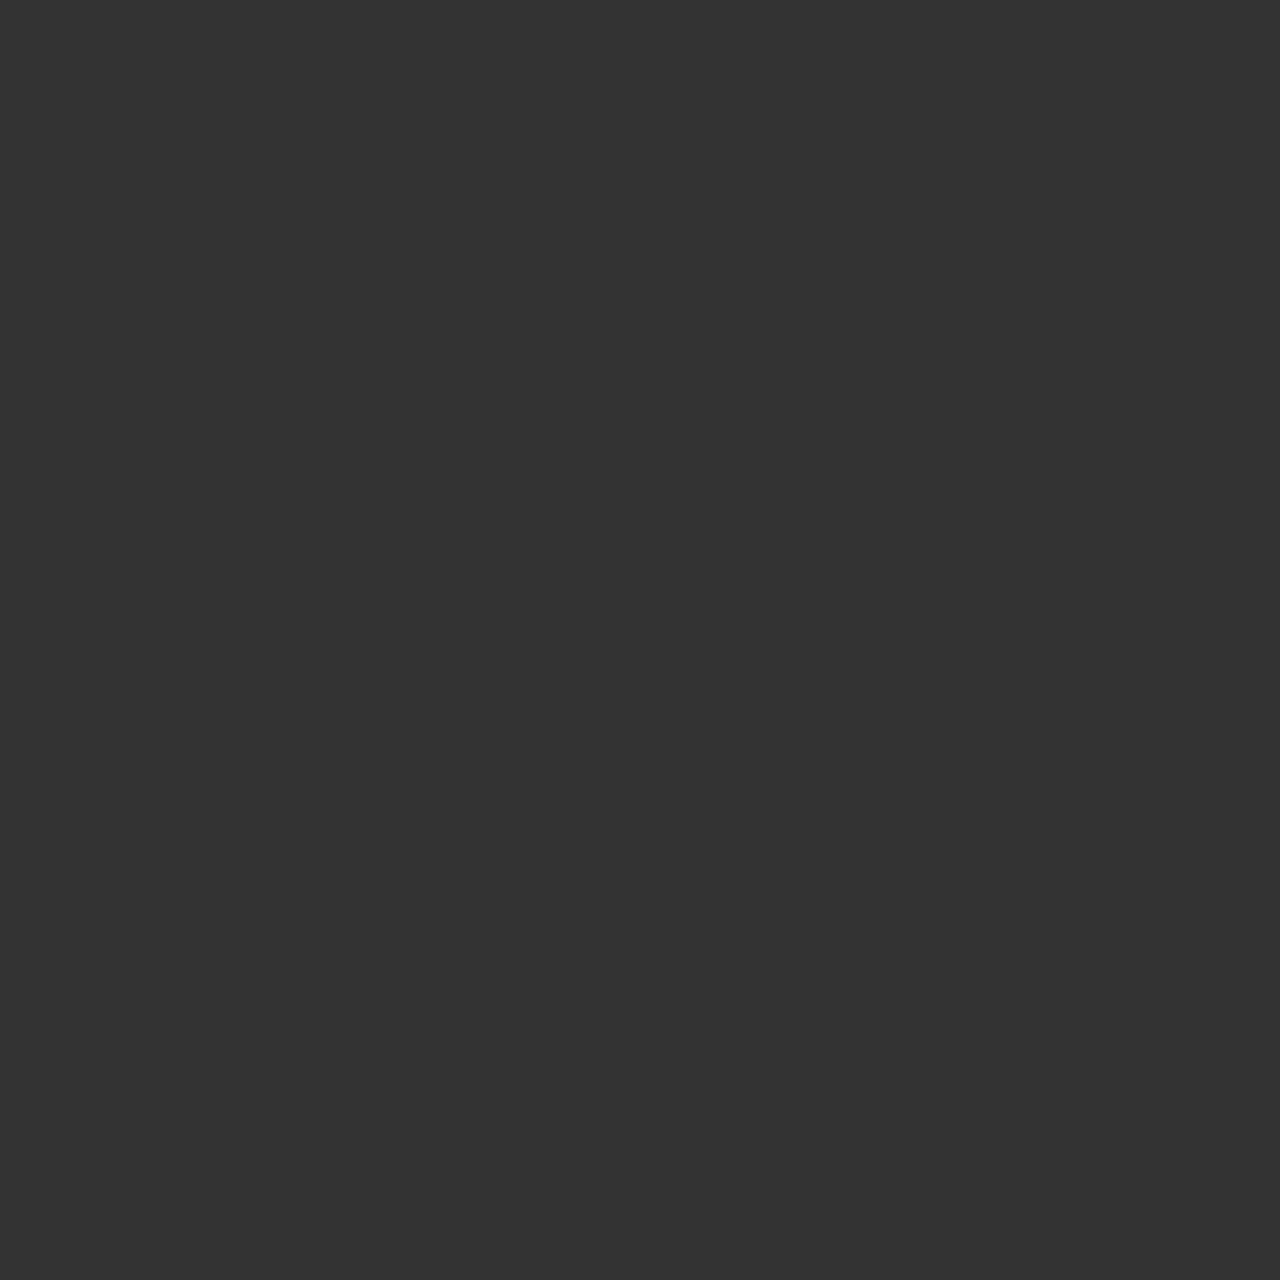 Алюкобонд тёмно-серый 8812 (3мм/18мкм) 1,22мХ2,44м